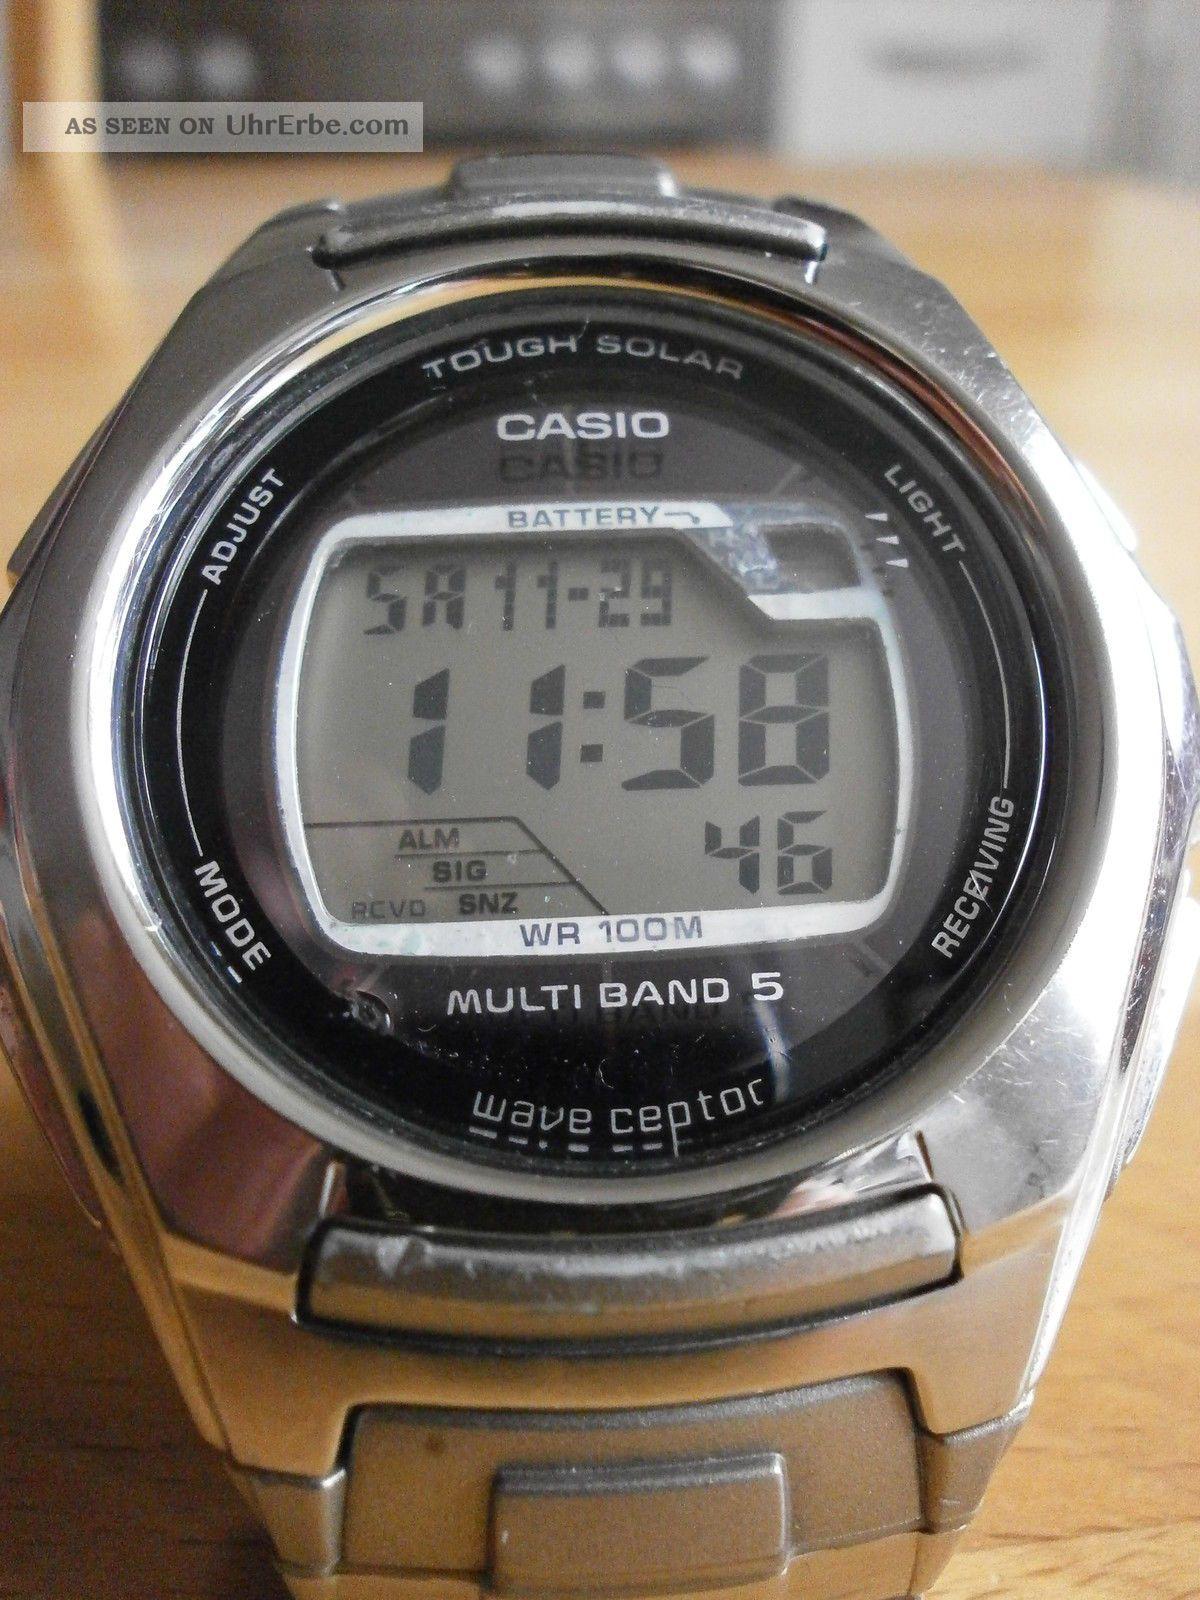 Casio Wv - M120 Wave Ceptor Tough Solar Armbanduhr Sportuhr Funkuhr Armbanduhren Bild